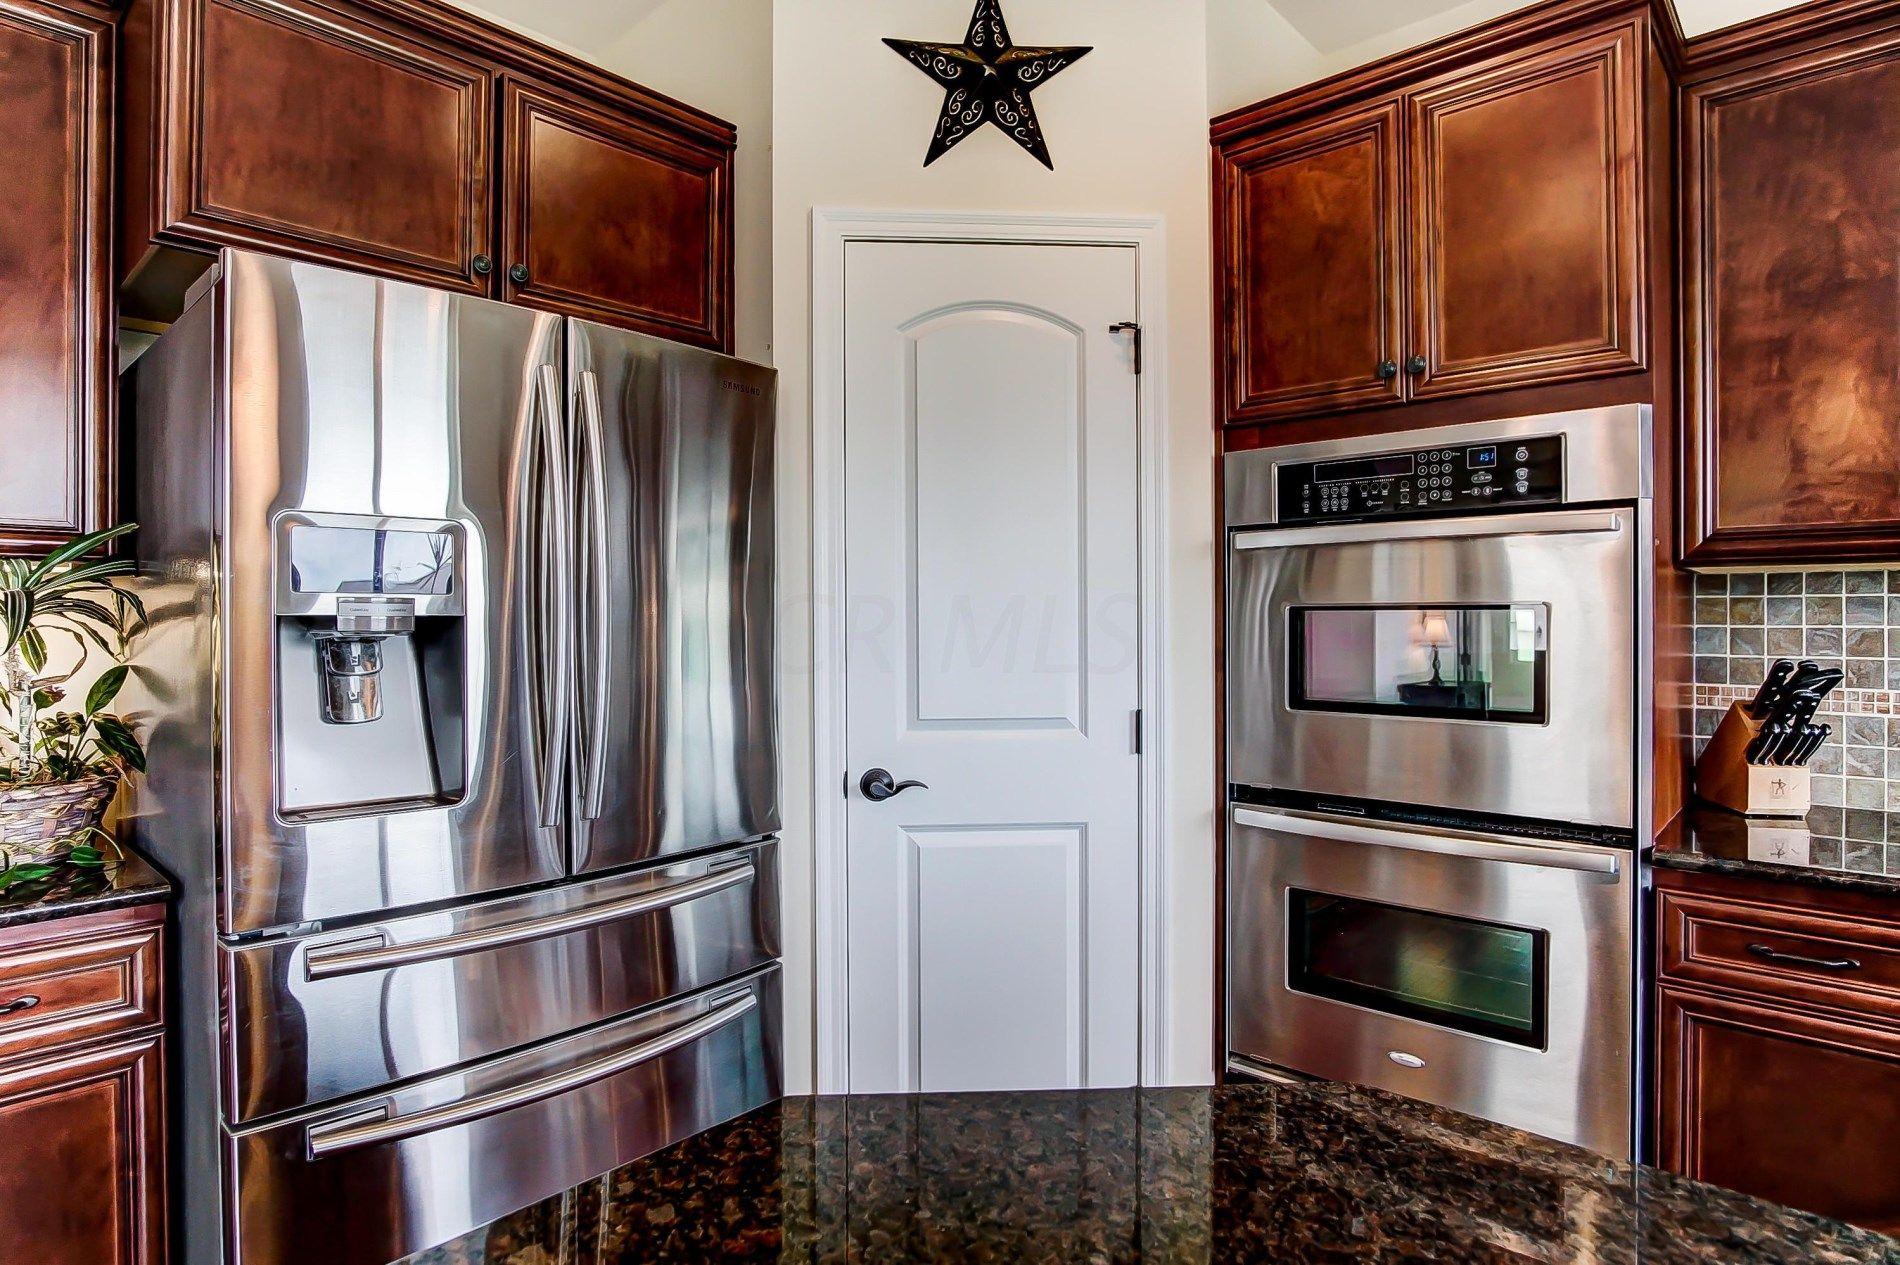 6635 Baronscourt Loop Dublin Oh 43016 Mls 218030111 Listing Information Her Realtors Columbus Cincinnati Dayton Ohio Ohio Real Estate Home Realtors